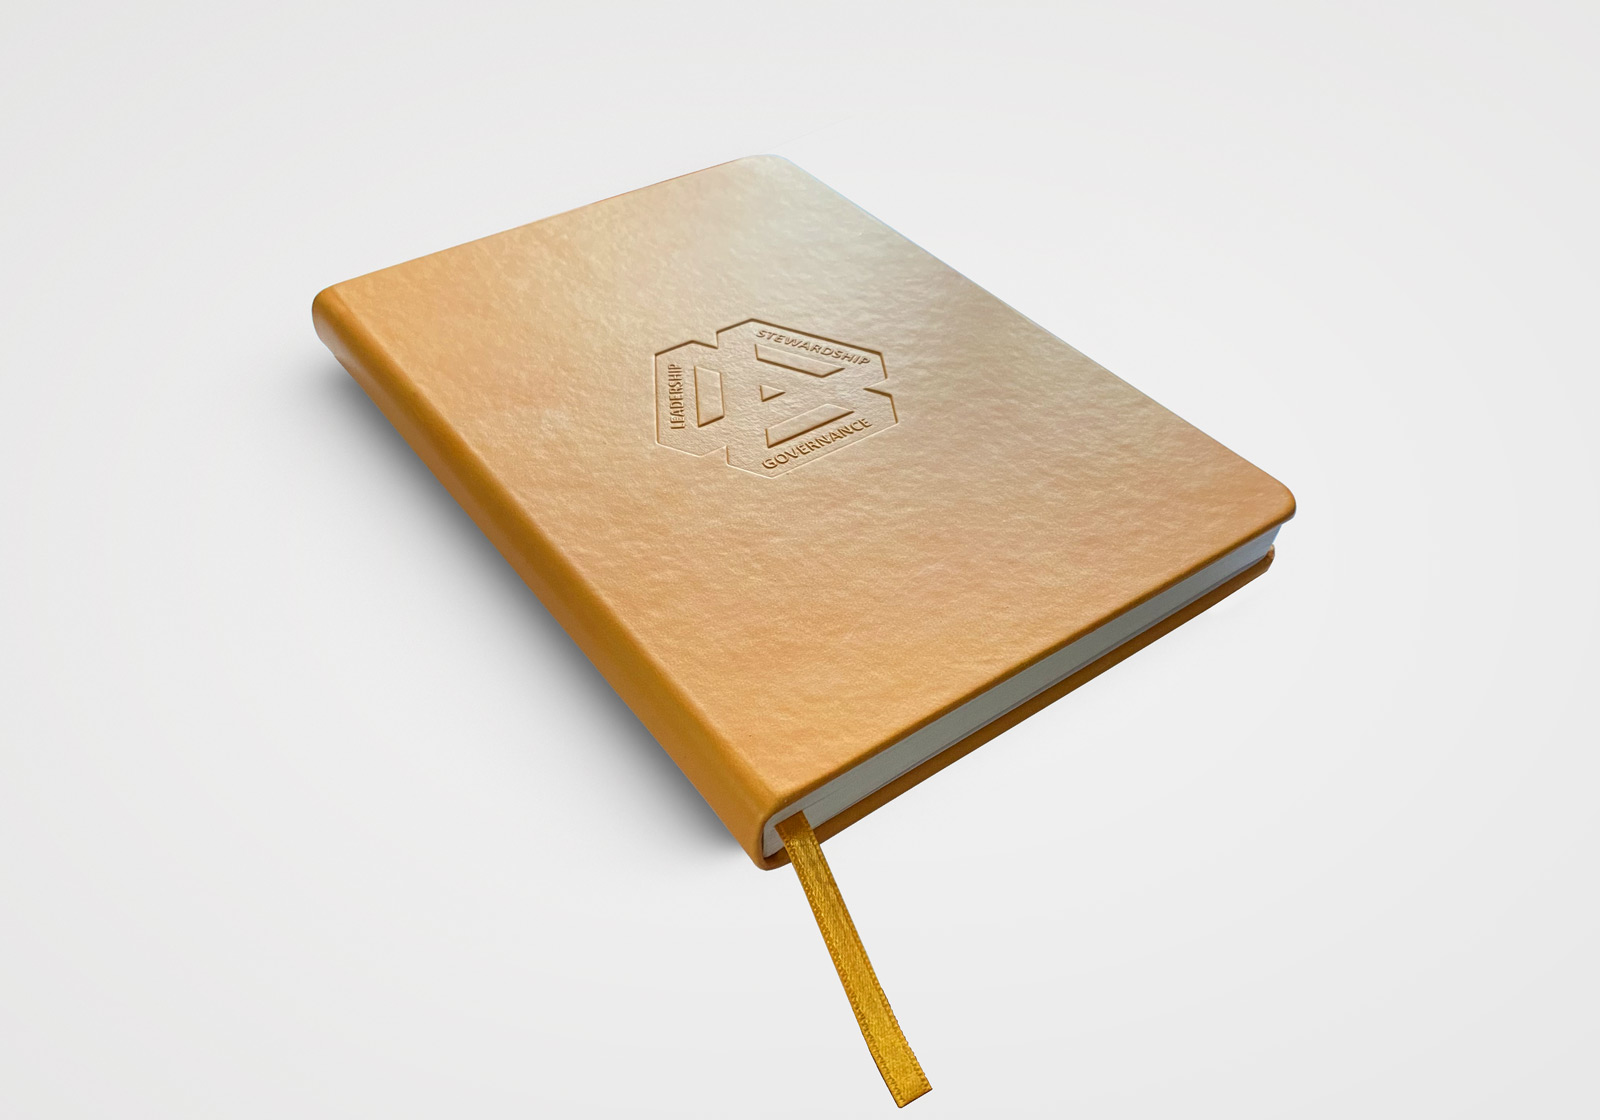 3ethos Journal